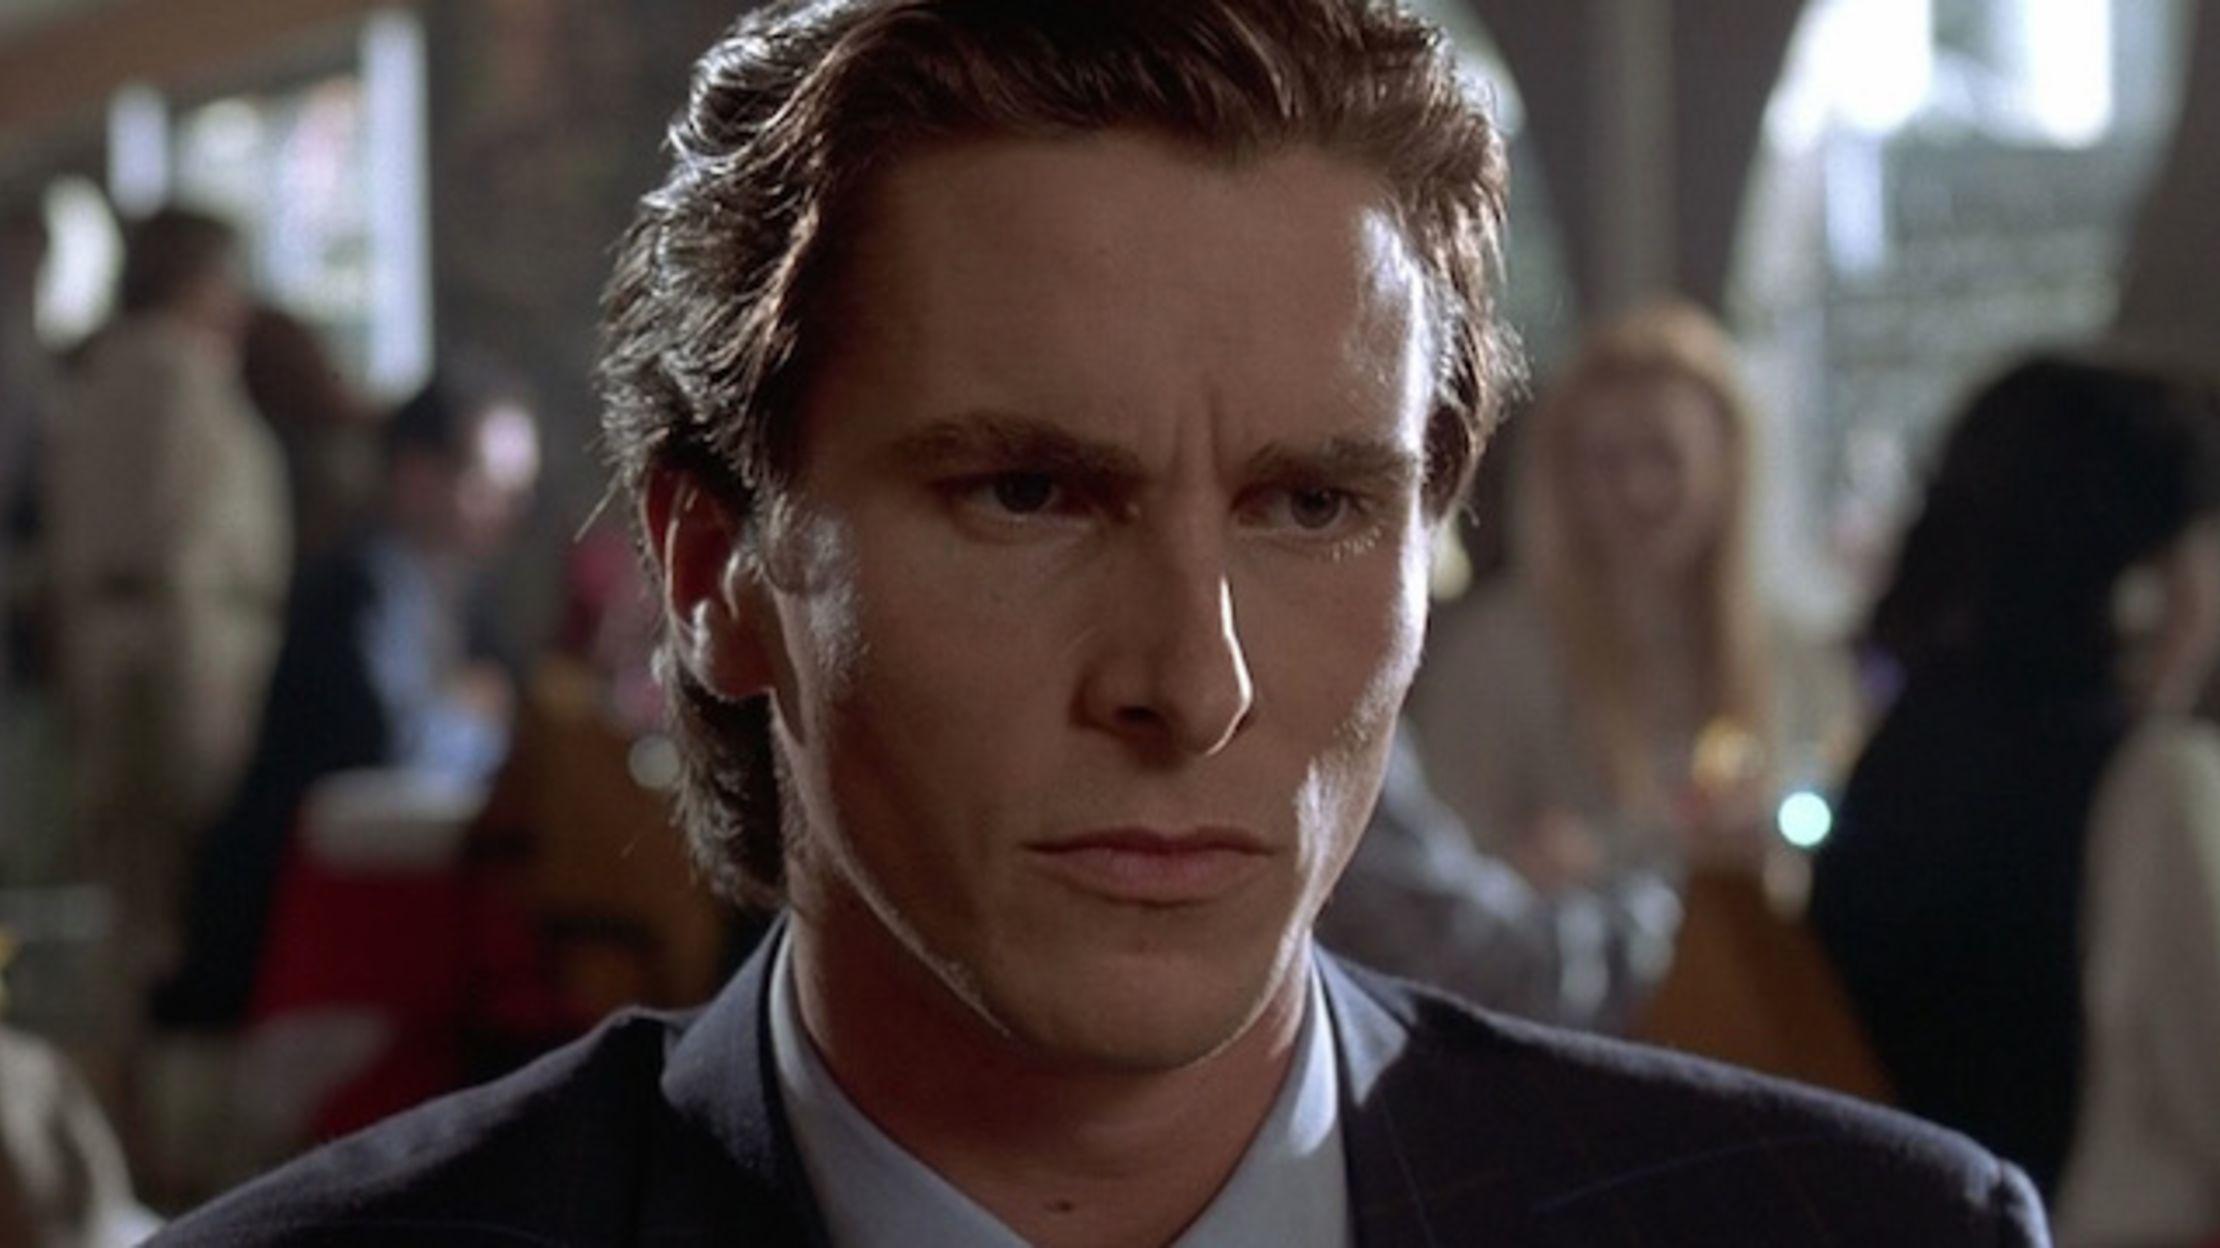 American Psycho 5 - نقد فیلم American Psycho (روانی آمریکایی) محصول 2000